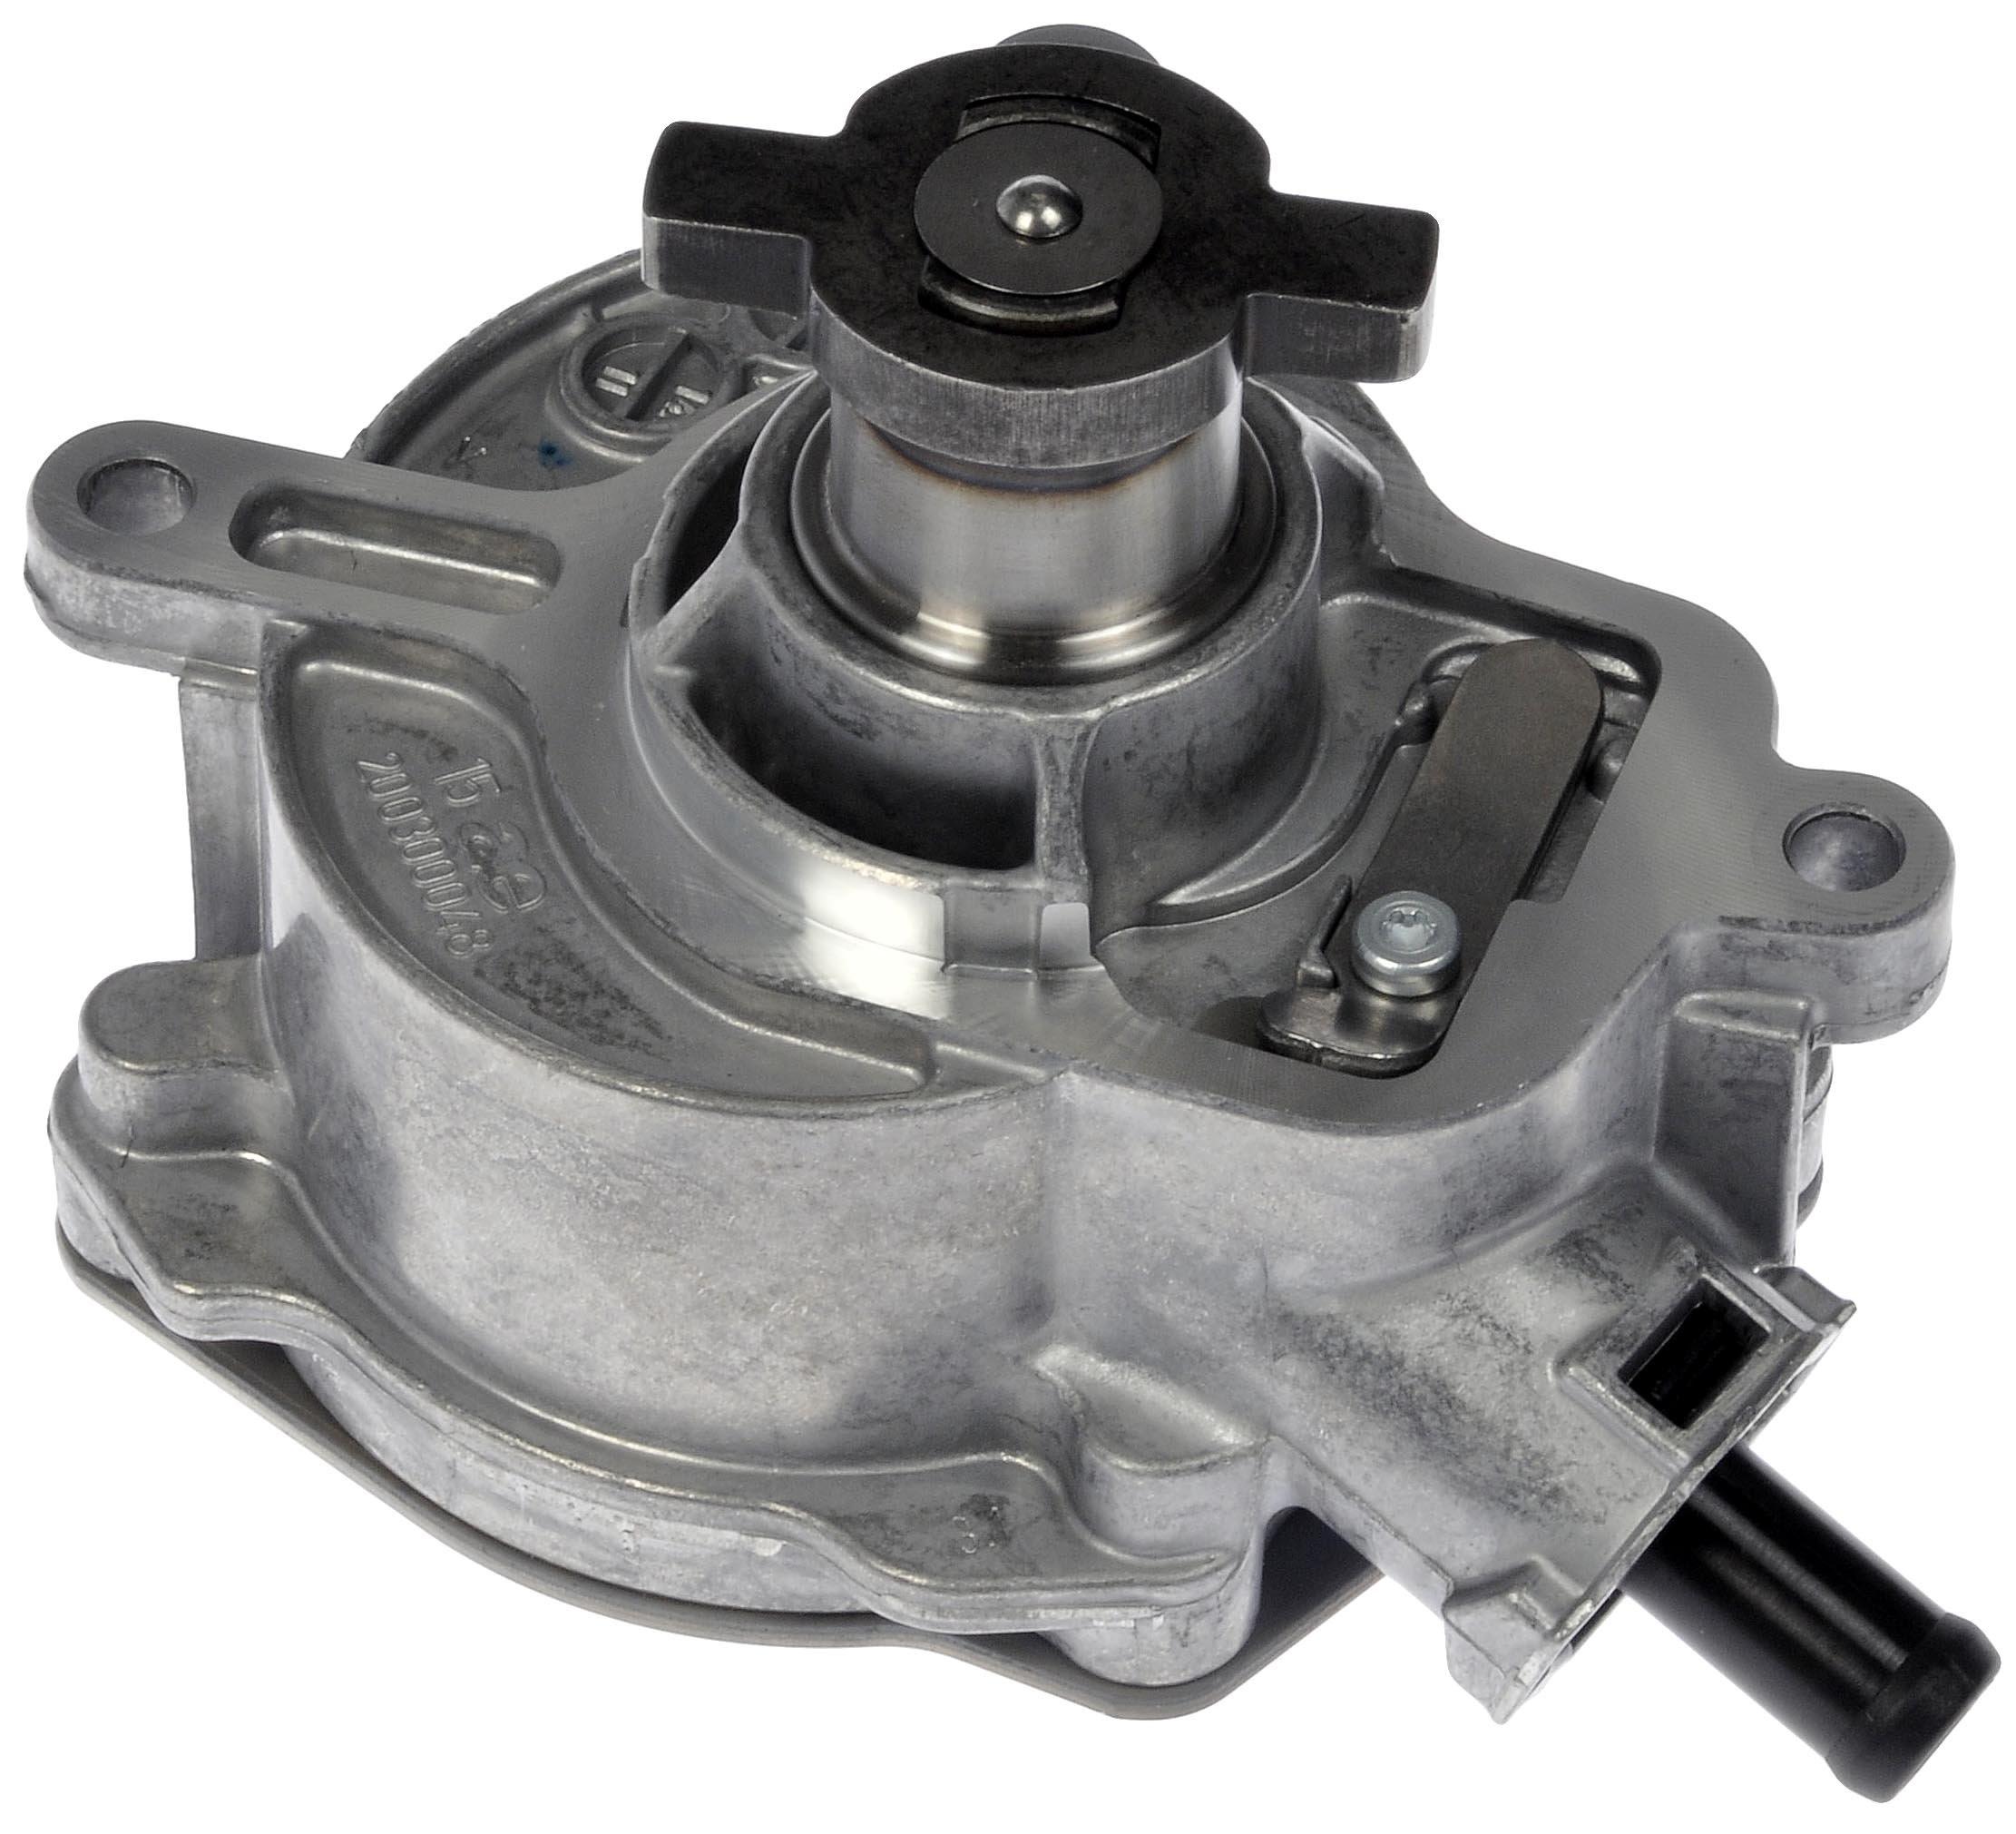 Dorman 904-817 Mechanical Vacuum Pump by Dorman